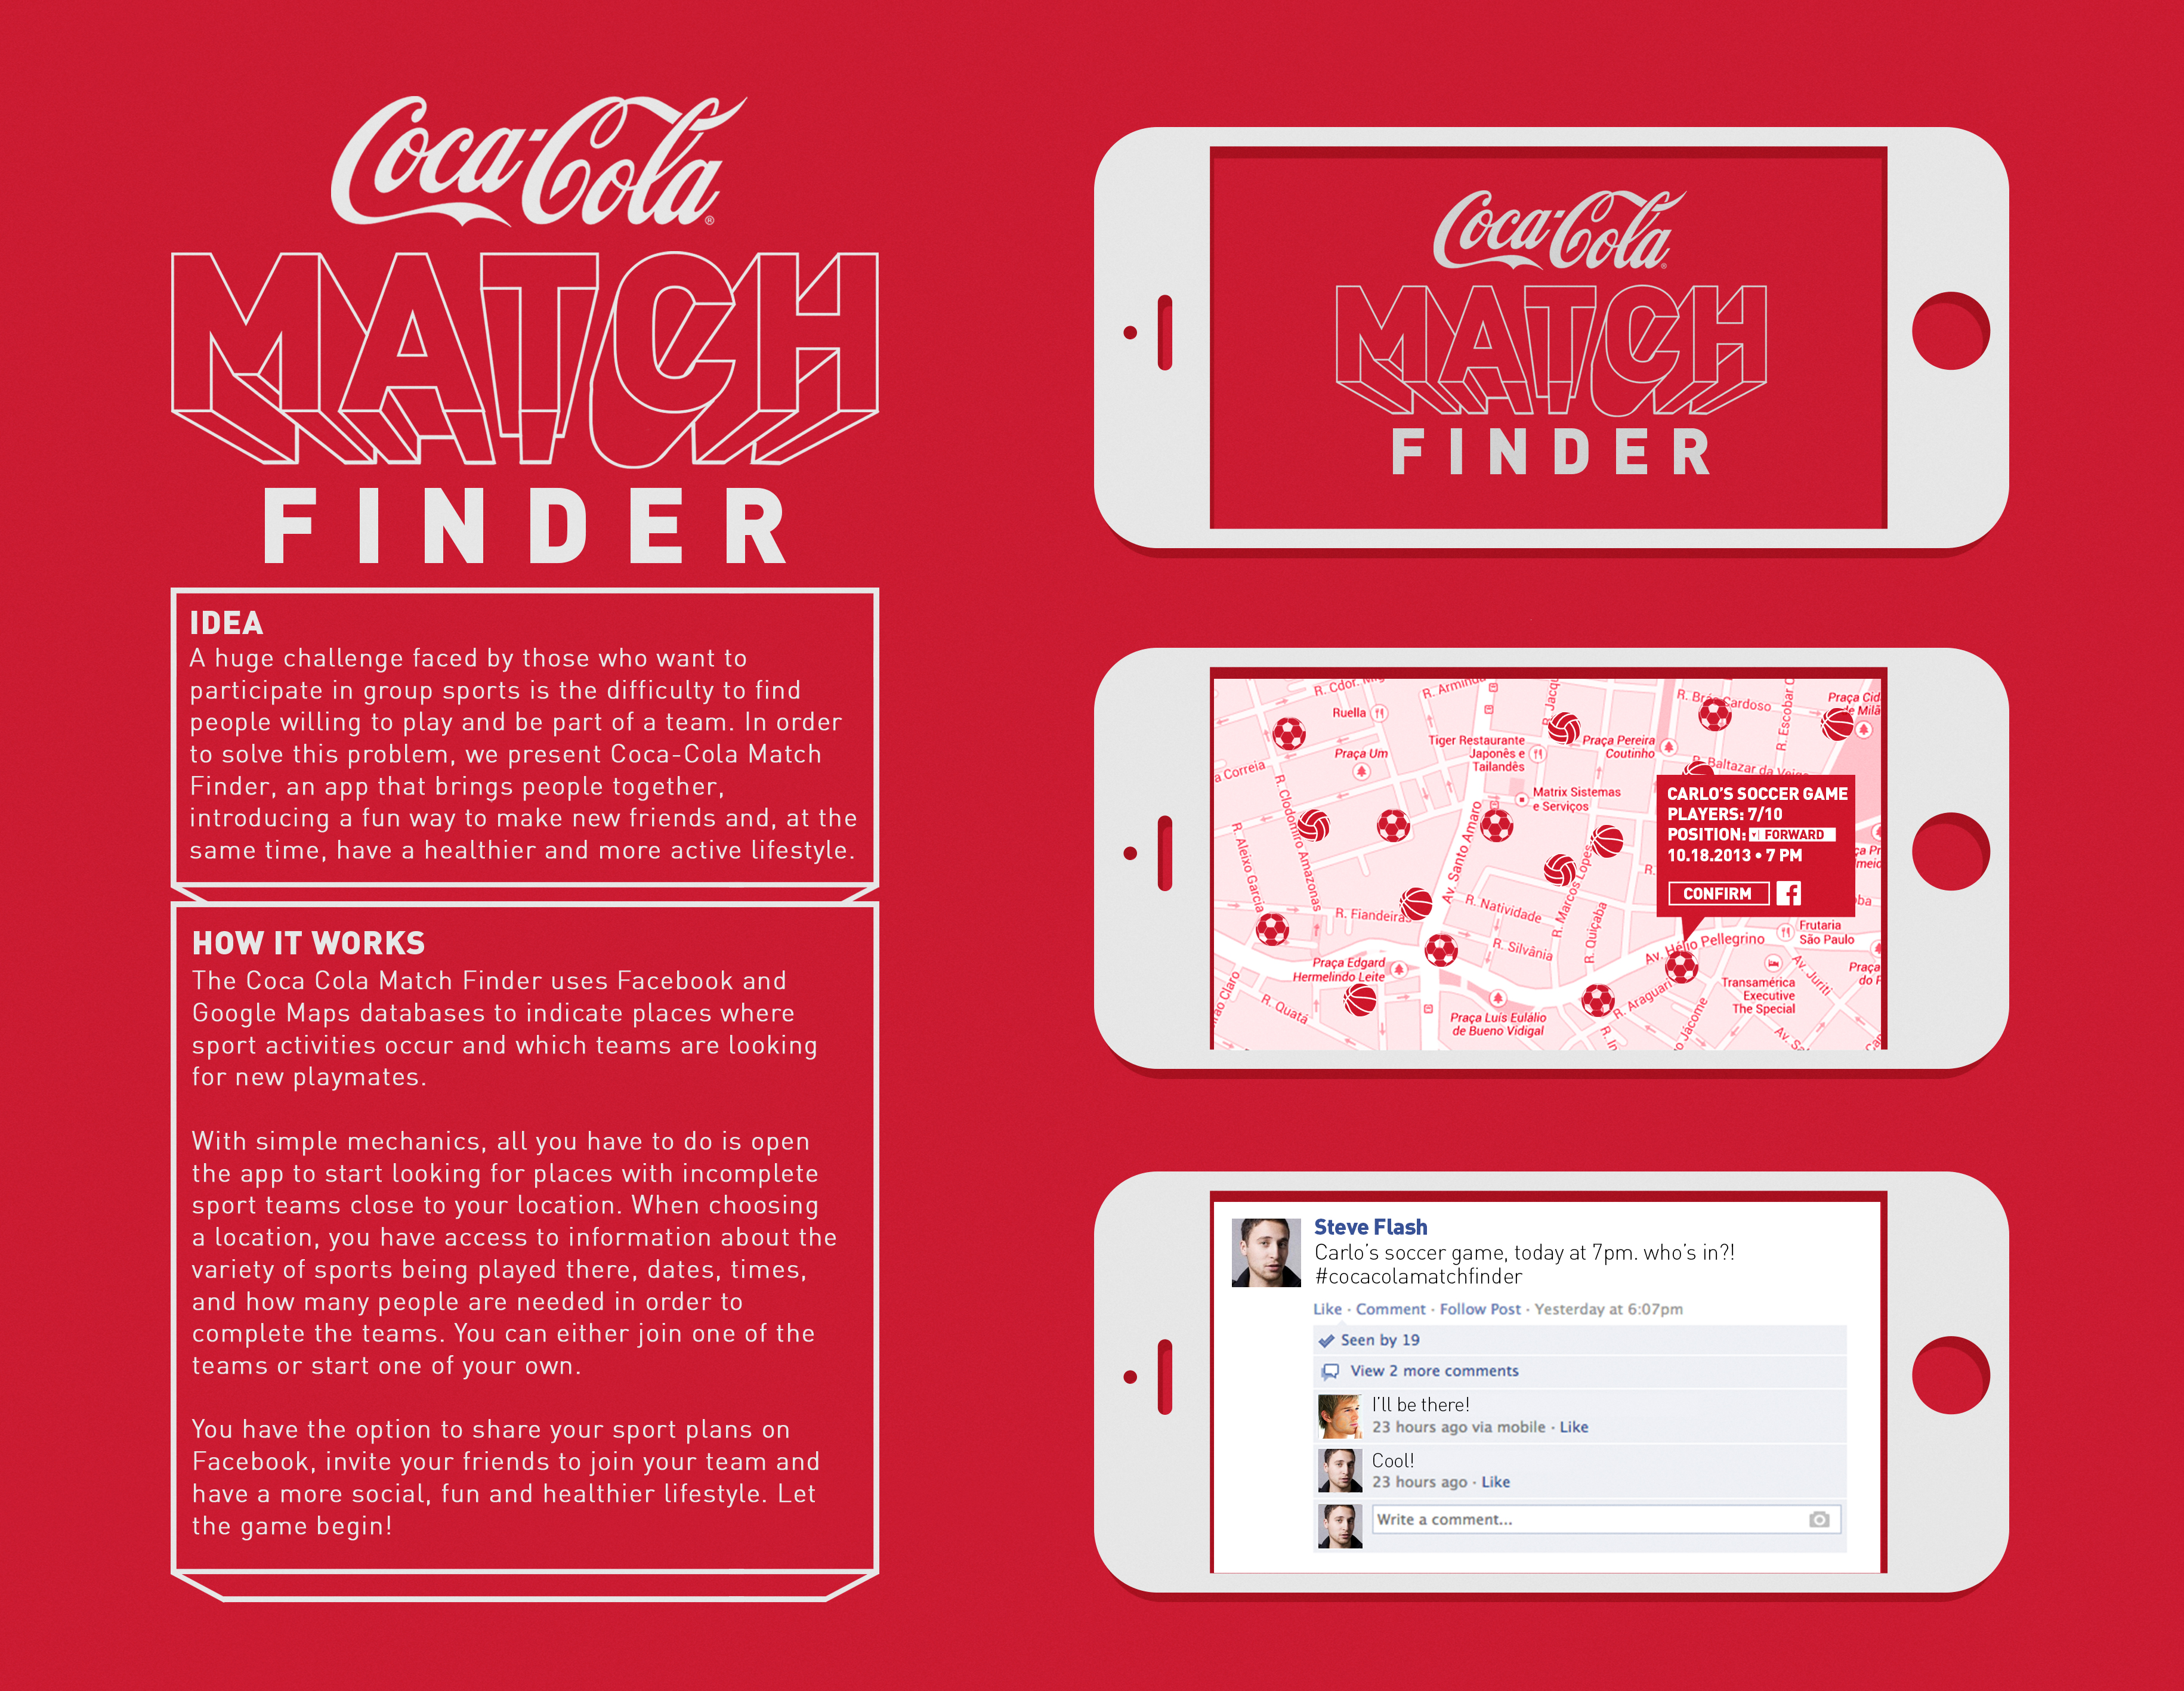 coca cola match_finder